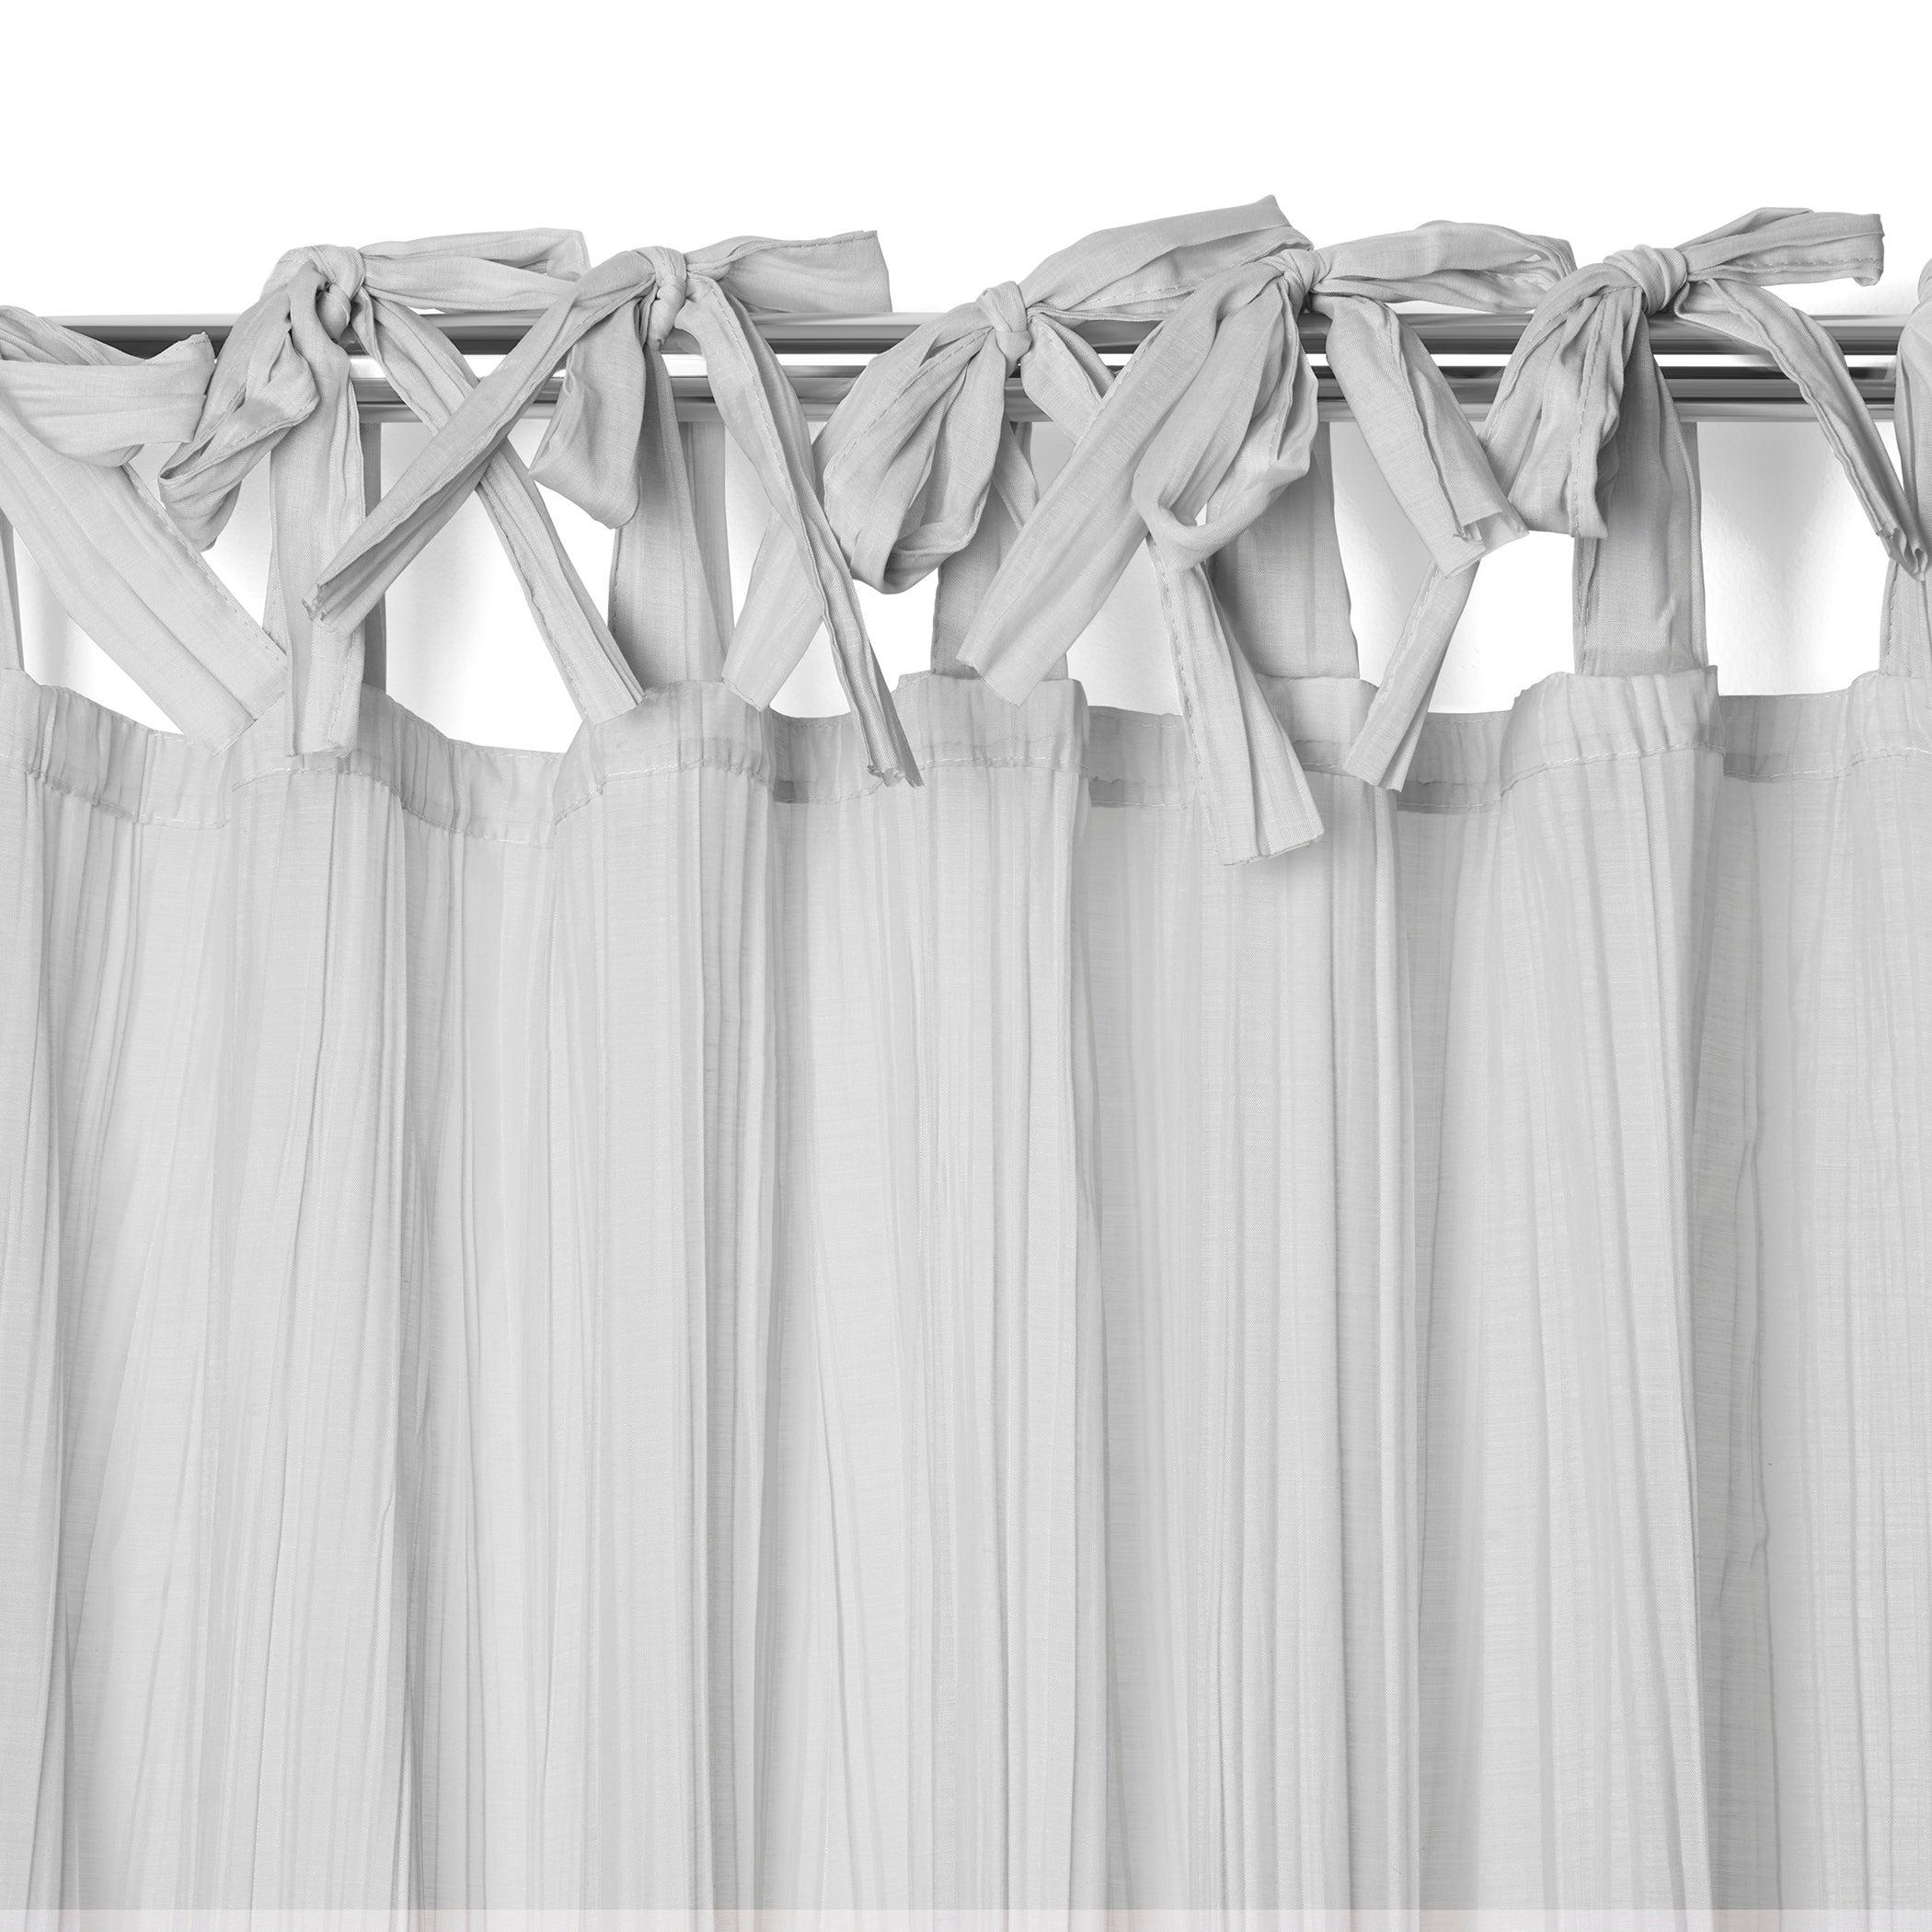 Elrene Jolie Tie Top Curtain Panel With Regard To Elrene Jolie Tie Top Curtain Panels (View 4 of 20)